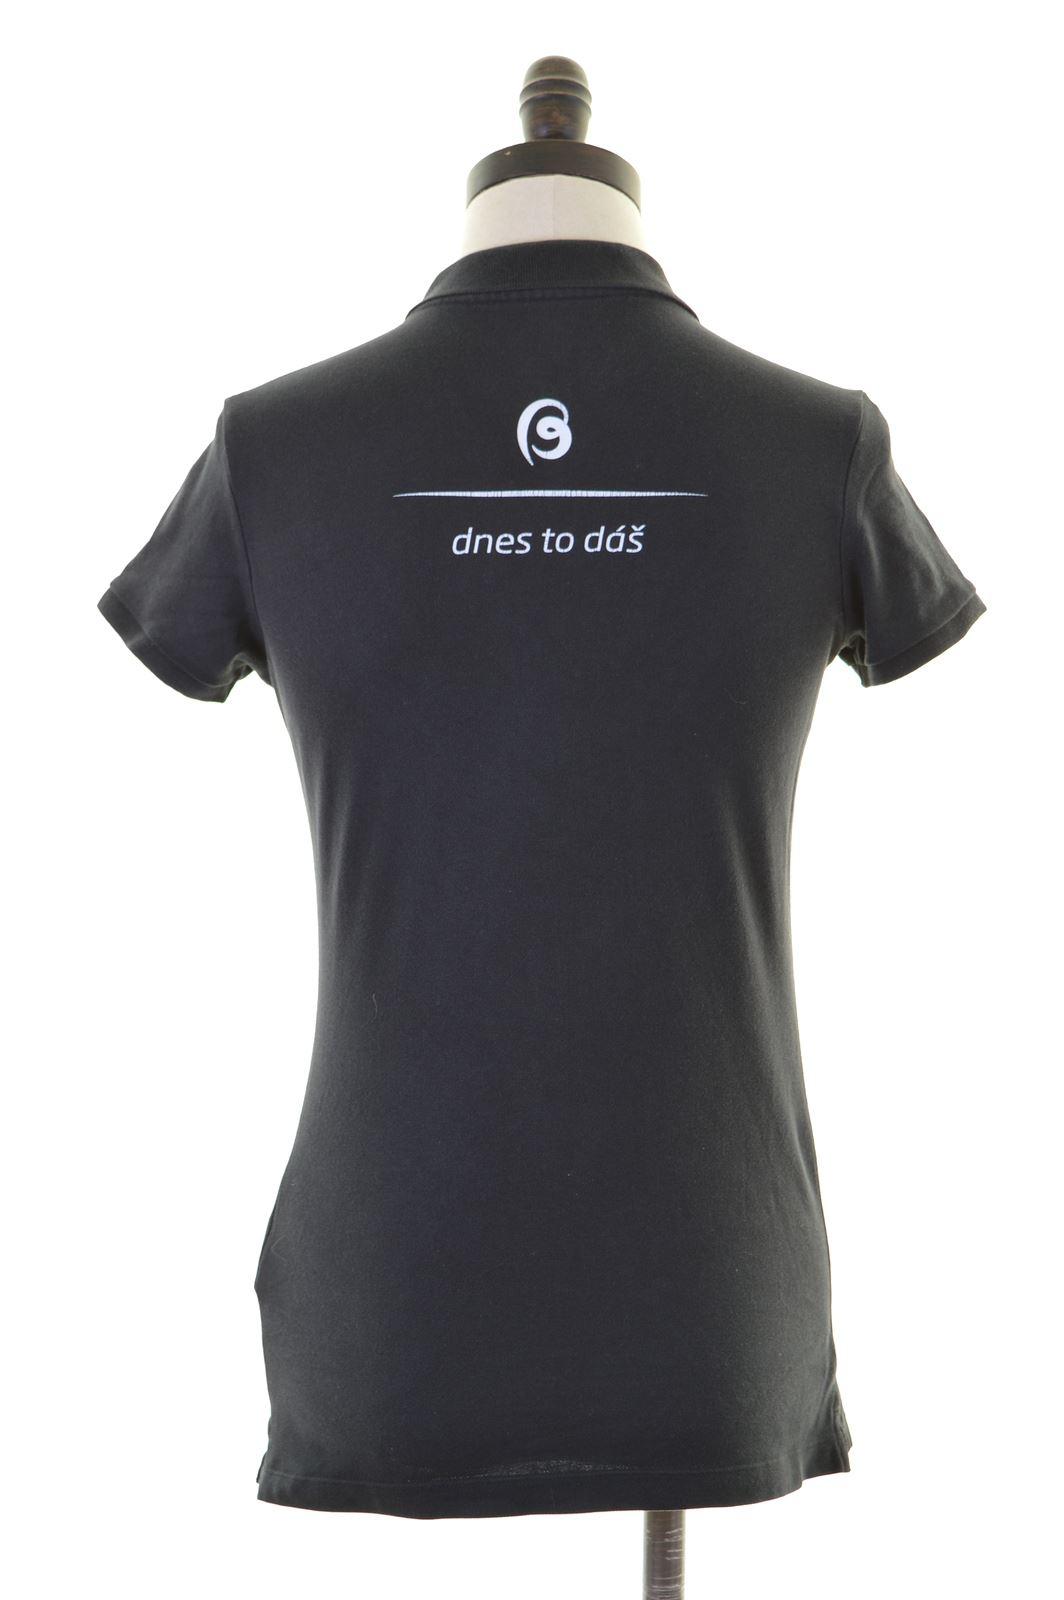 260860f8 NIKE Womens Polo Shirt Size 10 Small Black Cotton | eBay